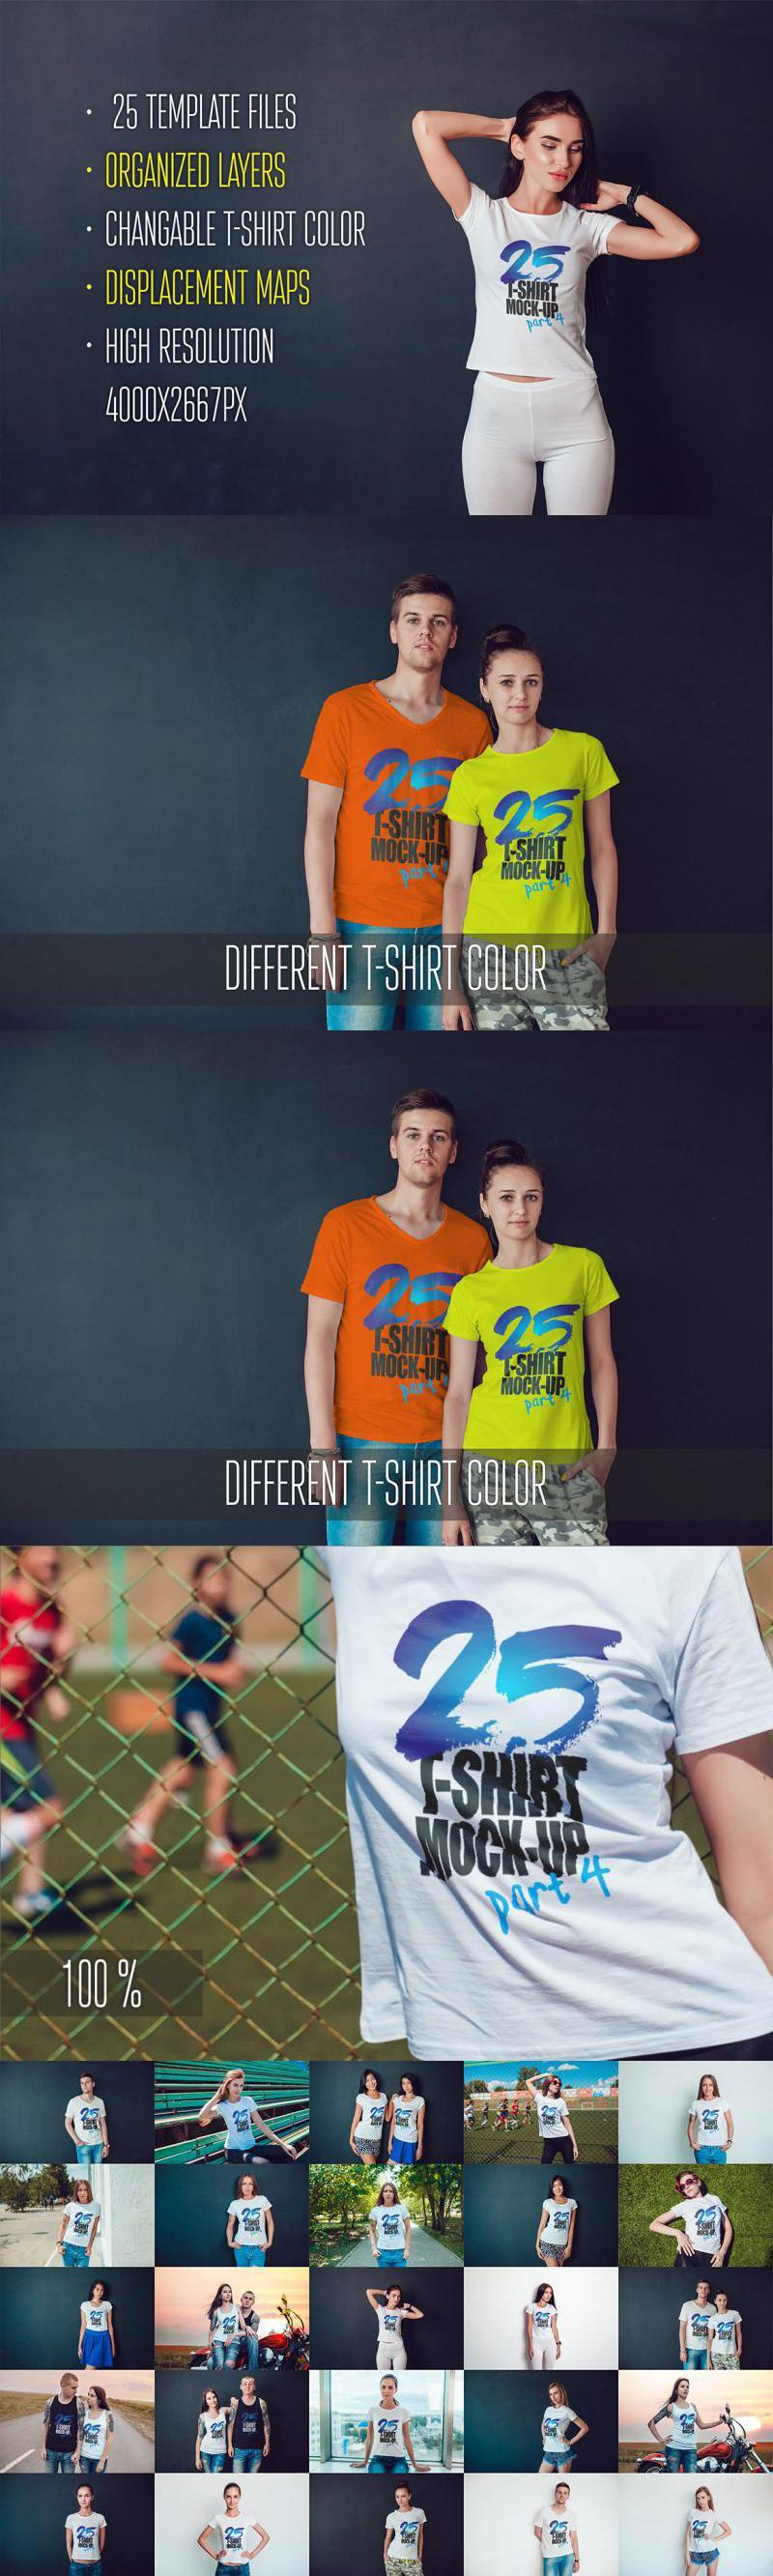 25 T-Shirts Mock-Up (Part 4)